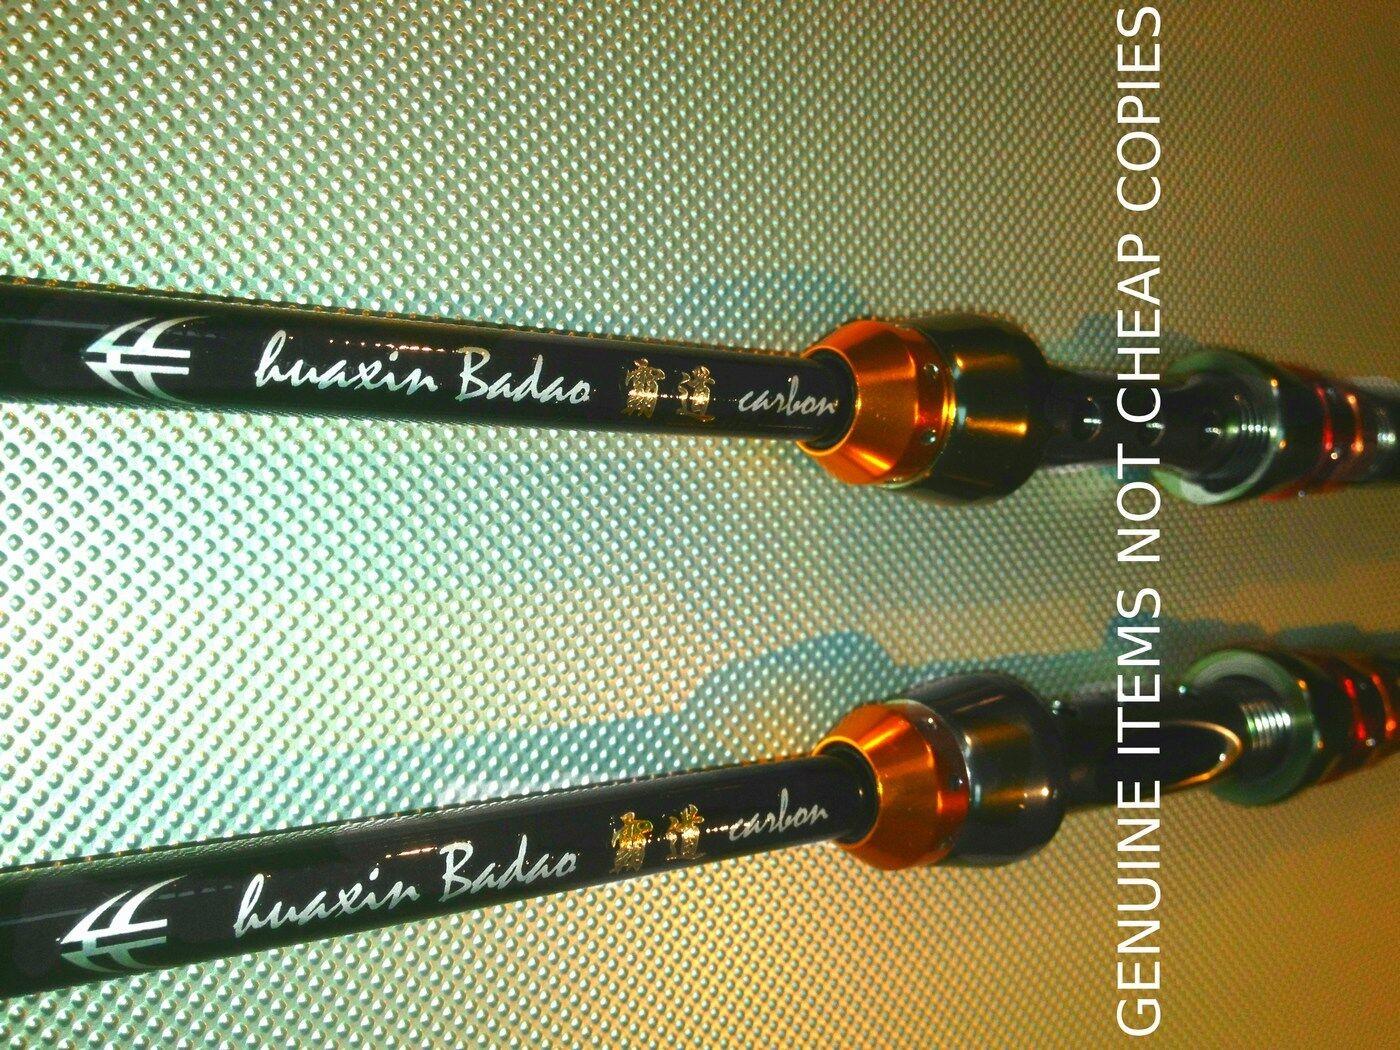 BADEO 2.1M CARBON FIBRE FIBRE FIBRE SPINNING ROD & SPINNING REEL BASS ROD KAYAK ROD SURF ROD dd3be8